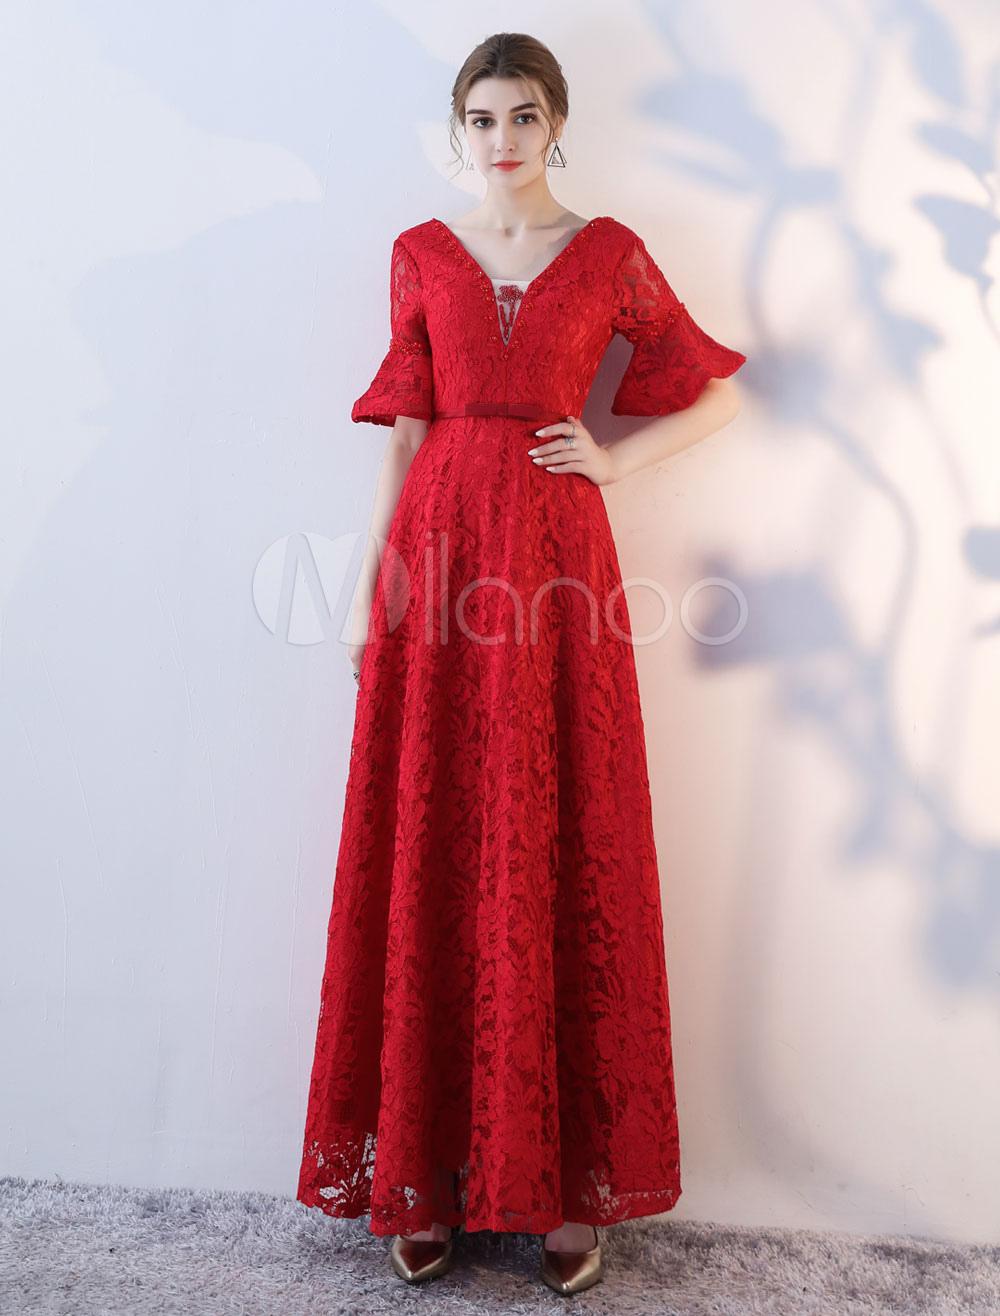 Prom Dresses Long Lace Half Sleeve V Neck Ruffles Beading Burgundy Formal Evening Dress (Wedding) photo